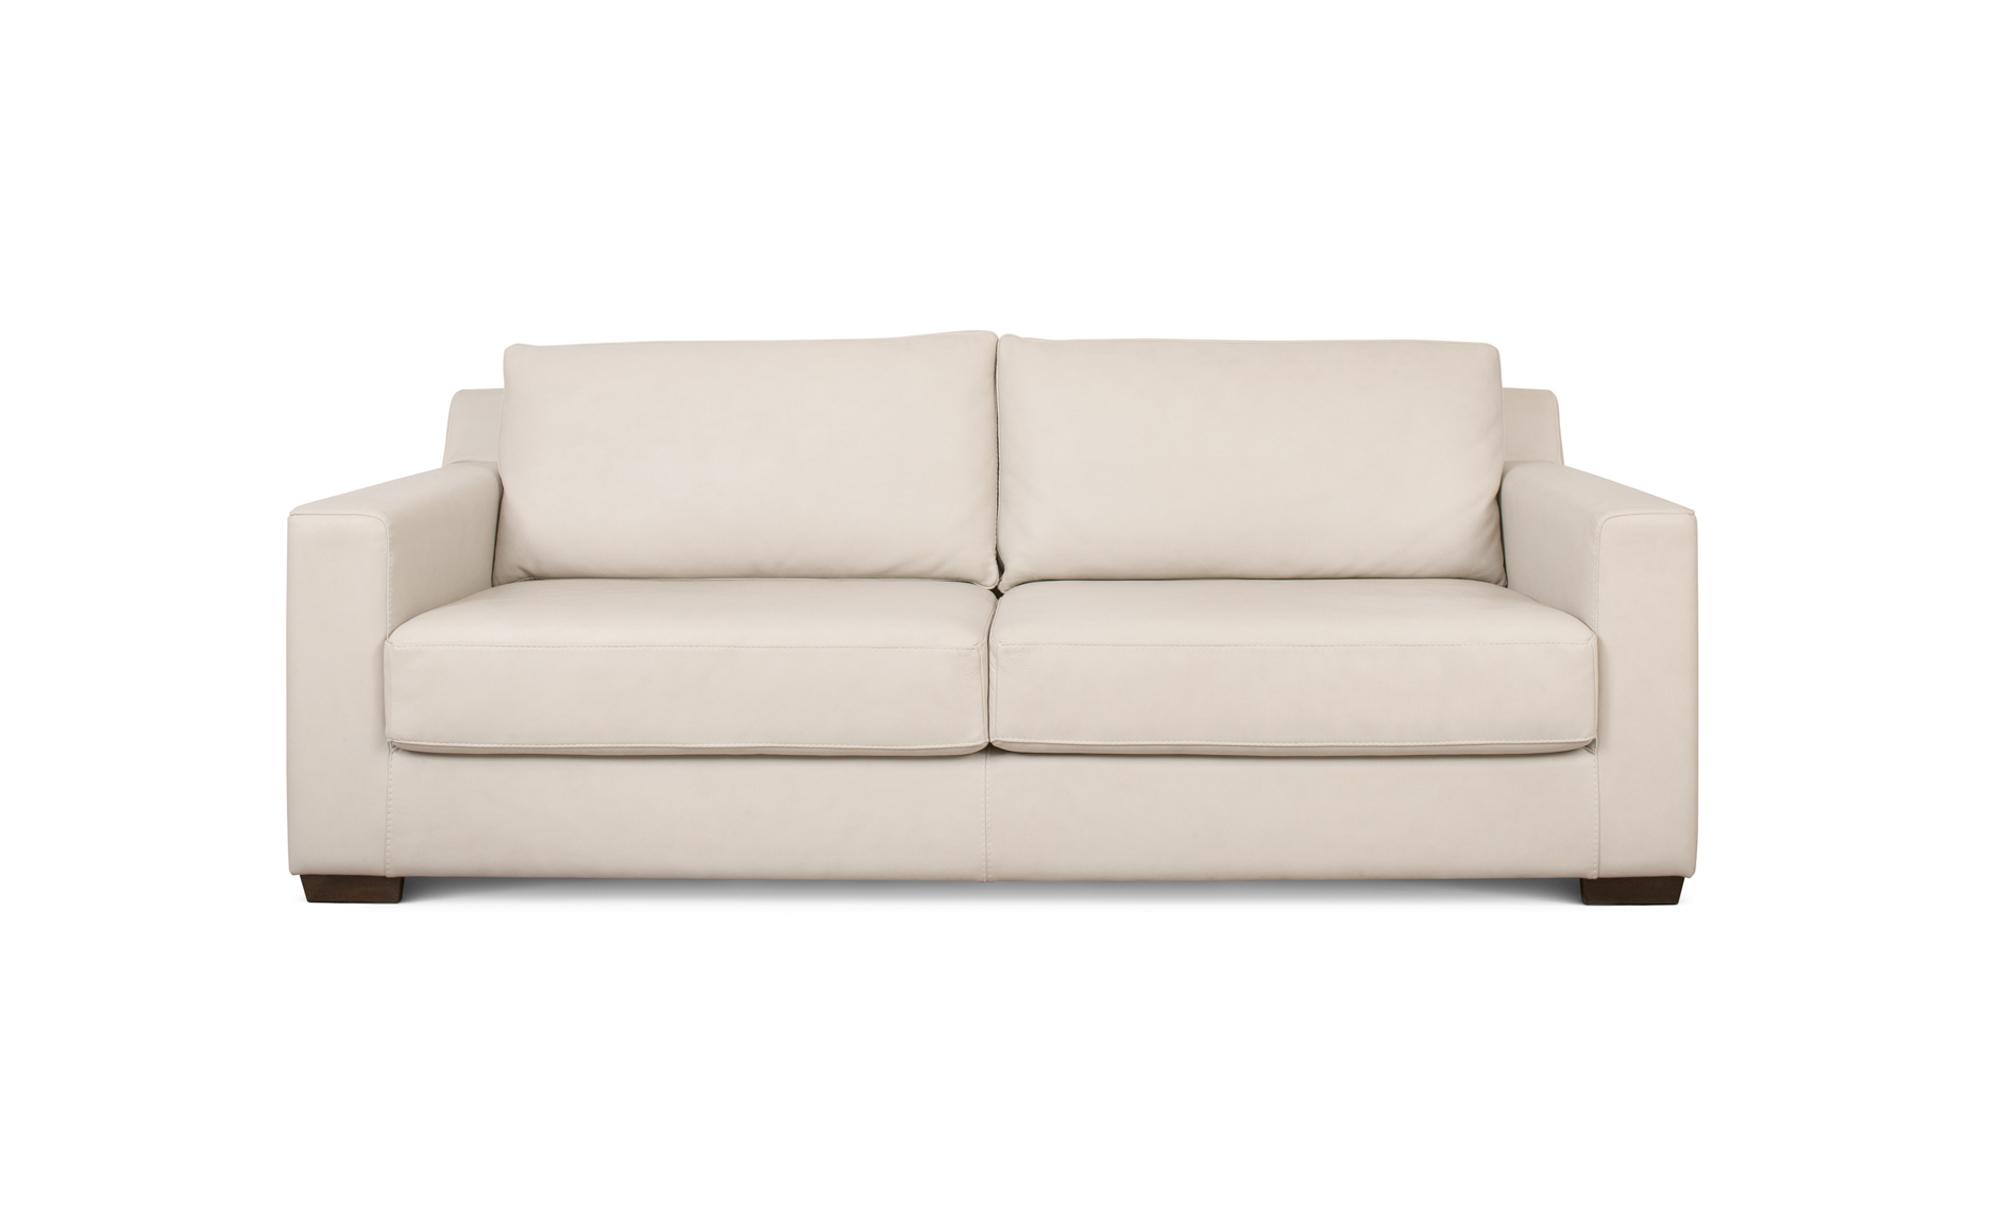 Hana Sofas Fanuli Furniture